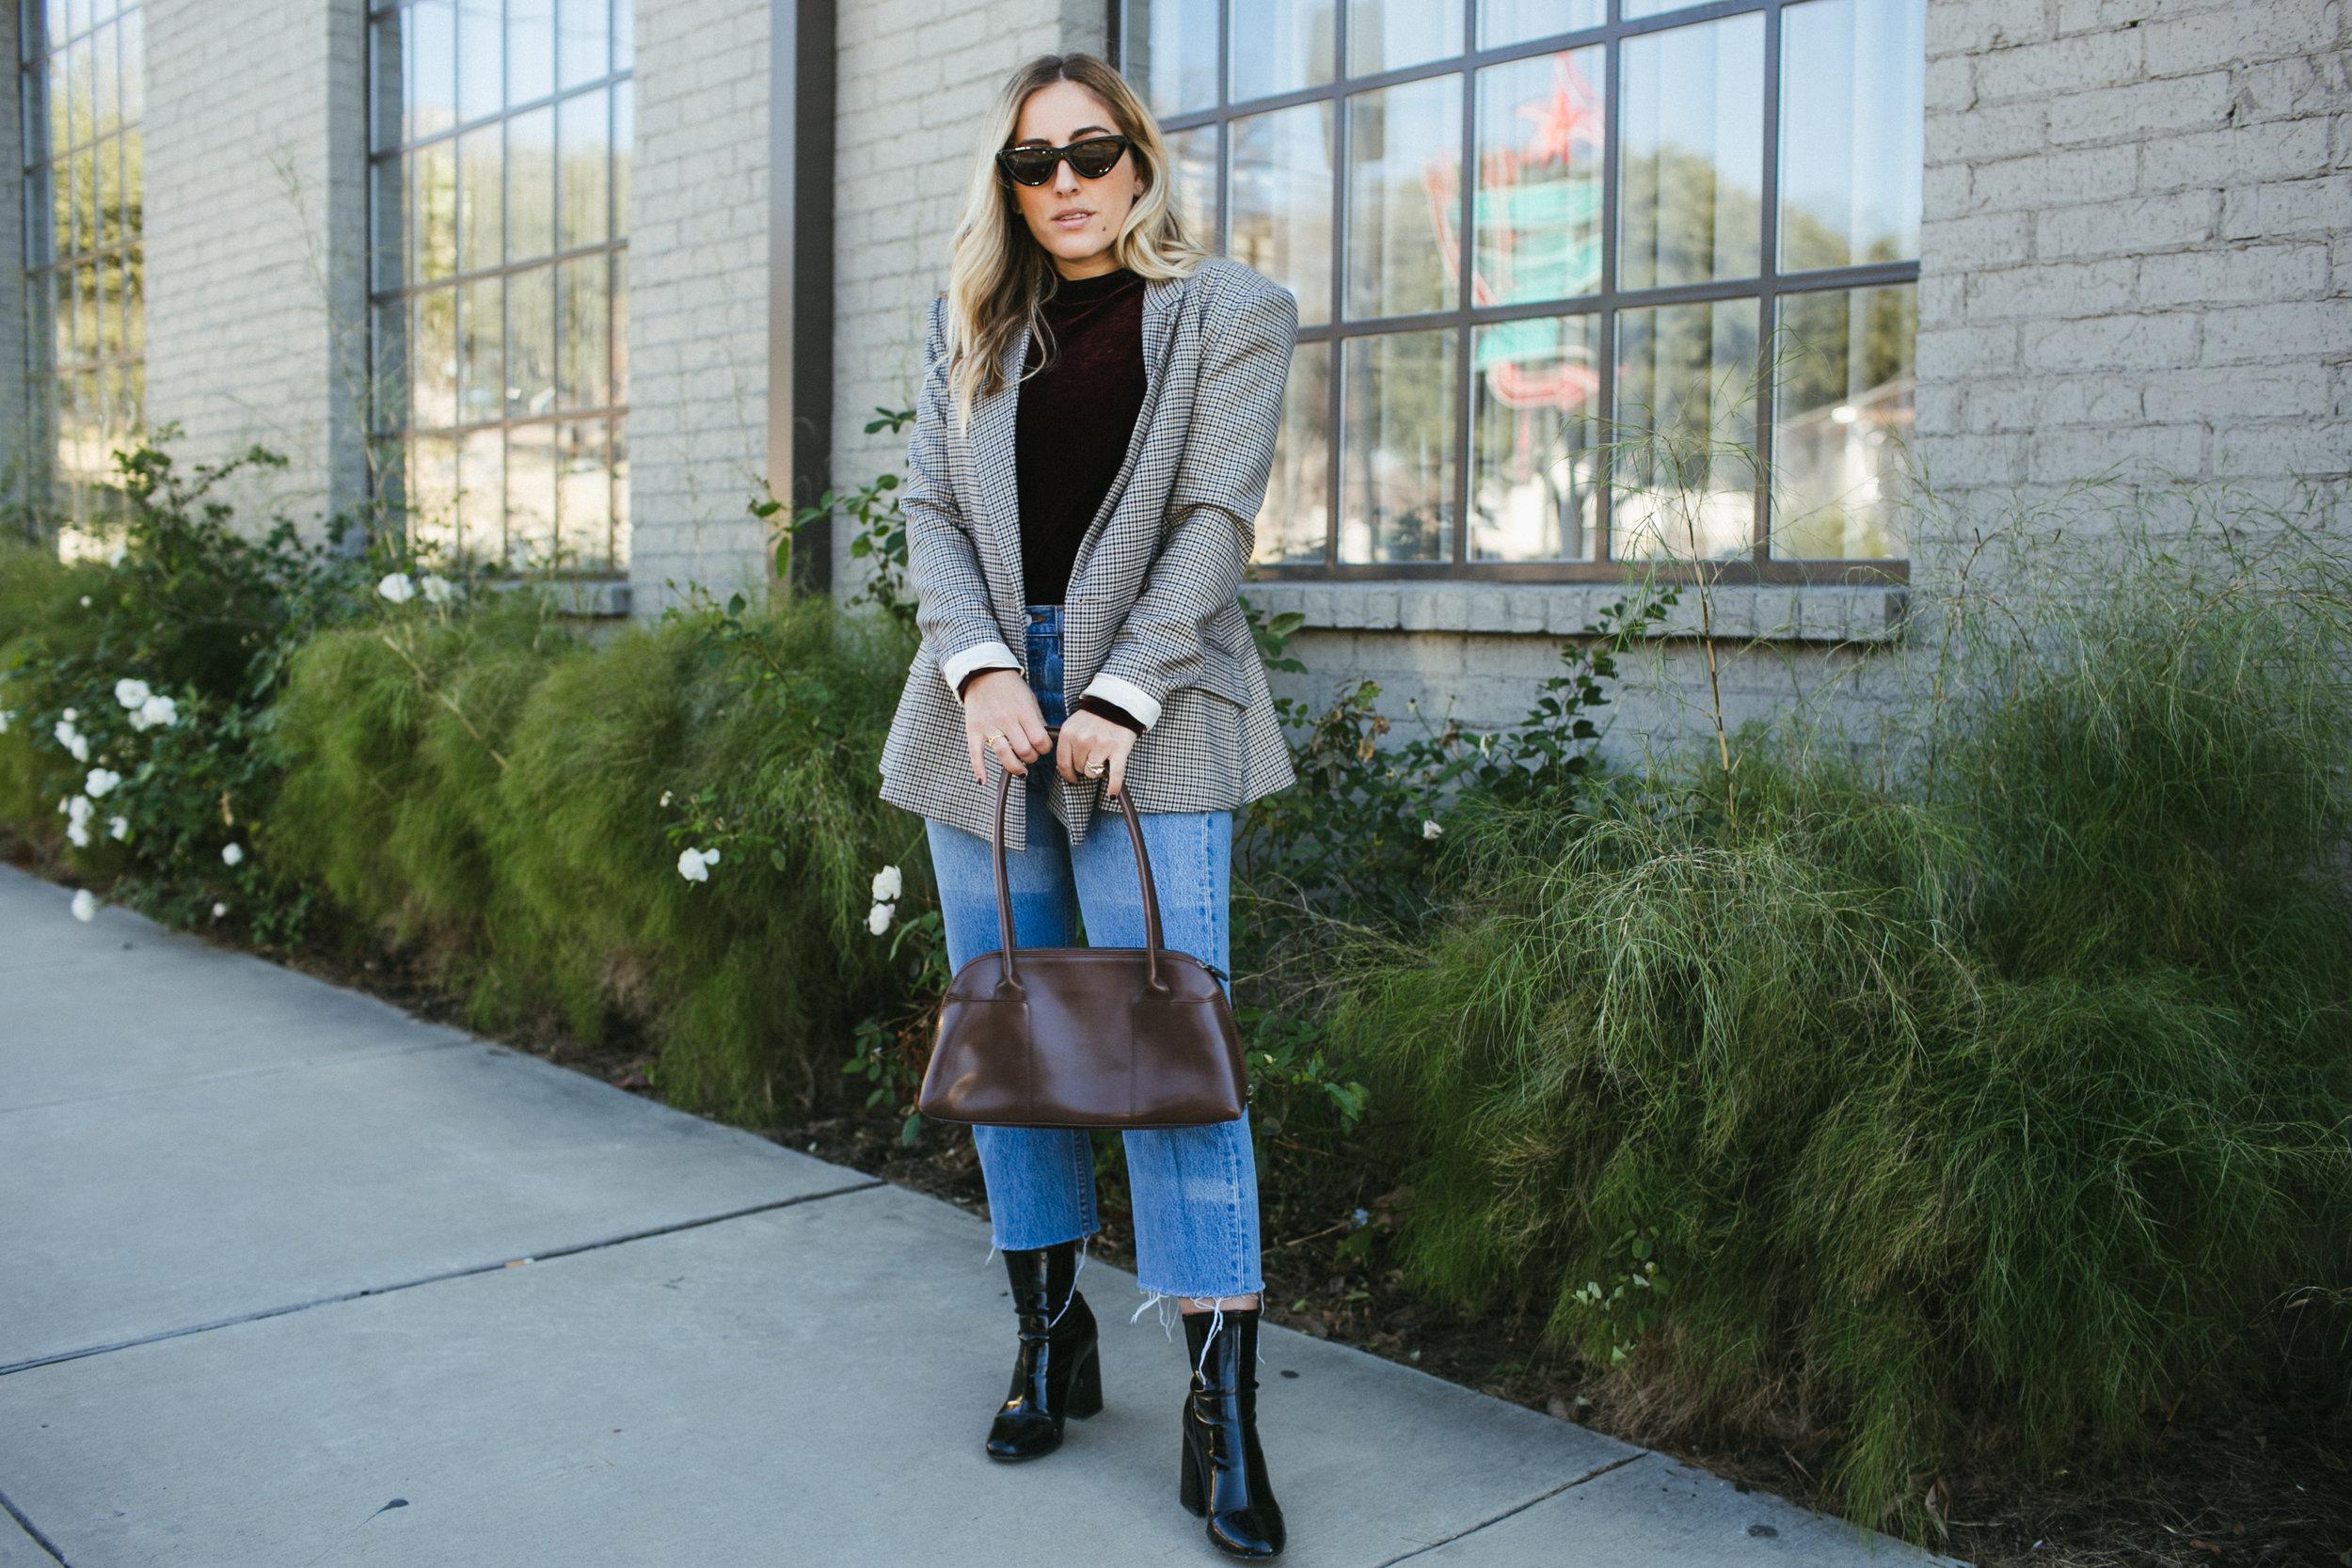 Paige-Newton-Lifestyle-Fashion-Blogger-Influencer-Photography-011.jpg